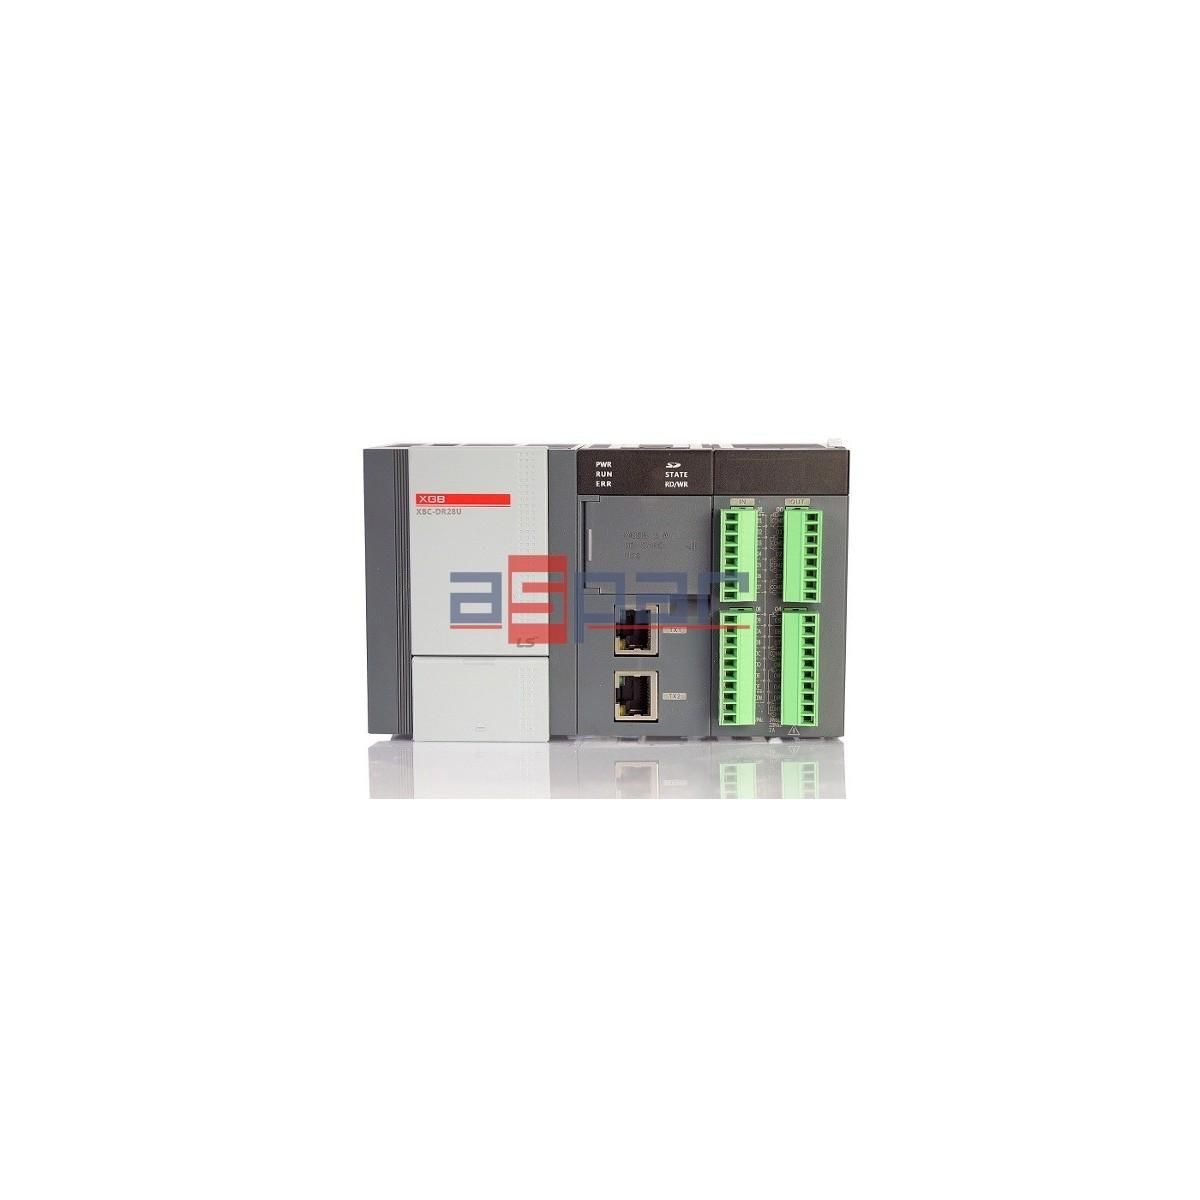 XBC-DR28U - 16 I/12 O relay, ethernet